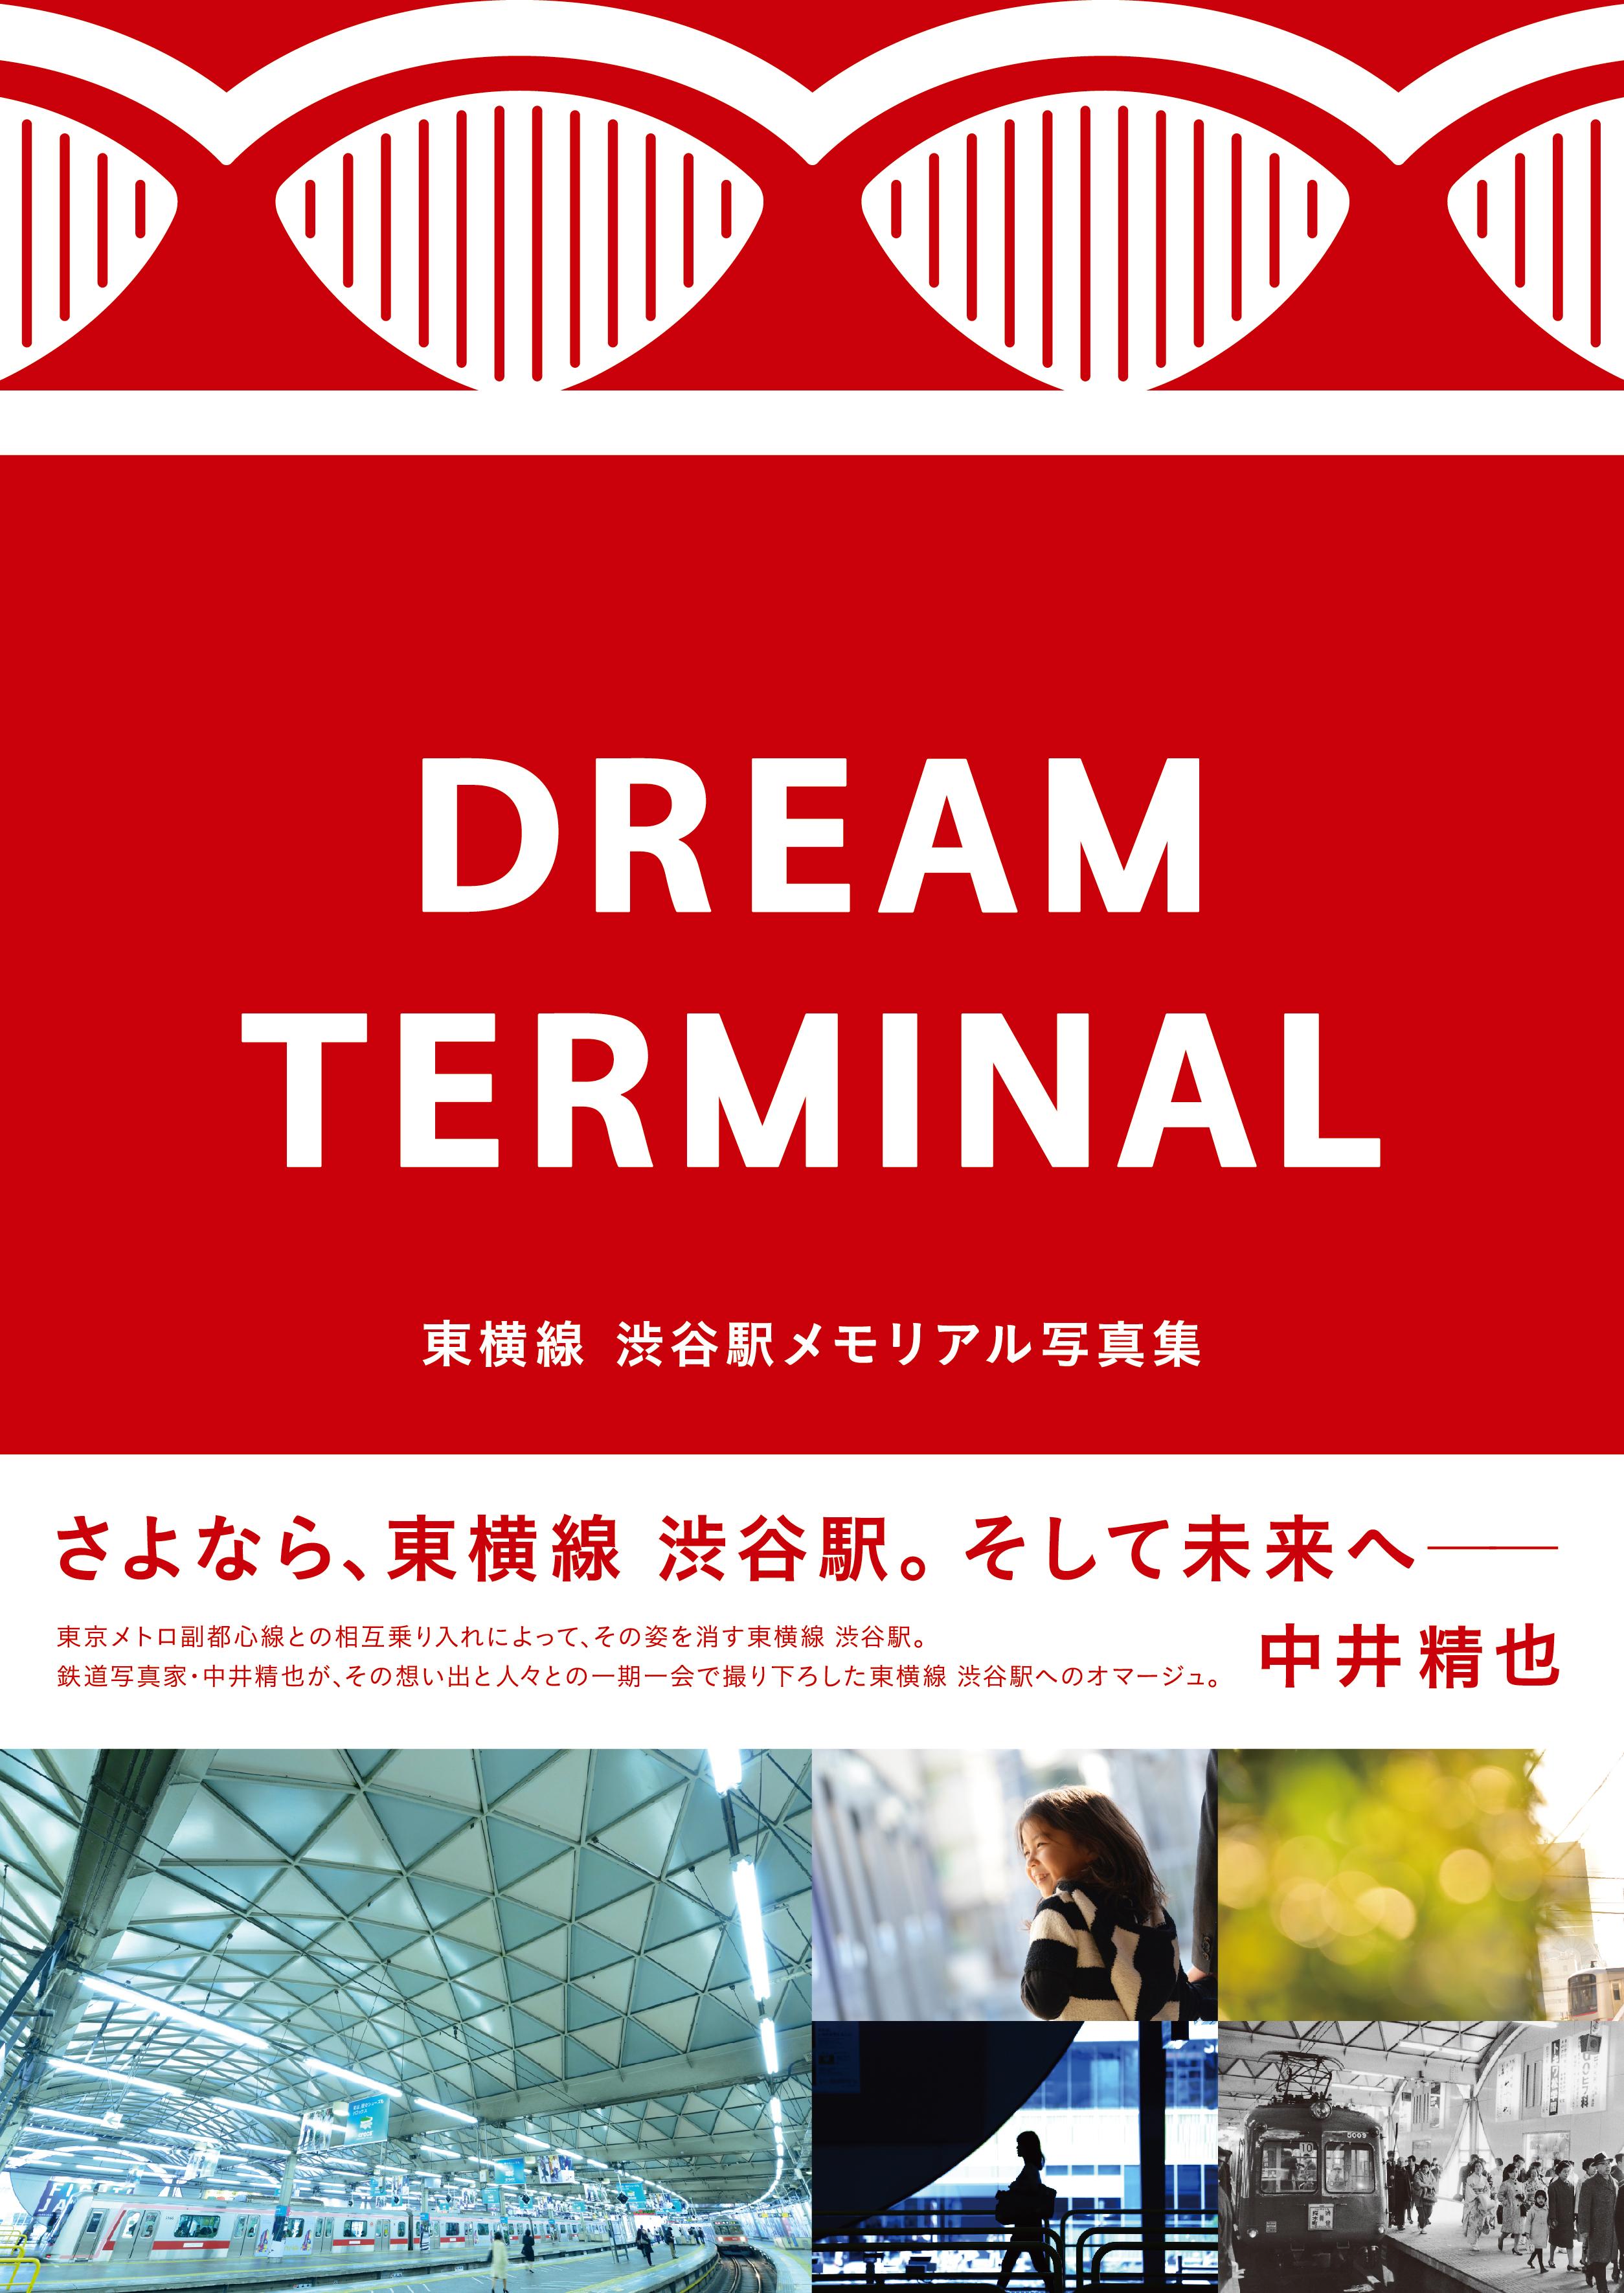 dreamterminal.jpg